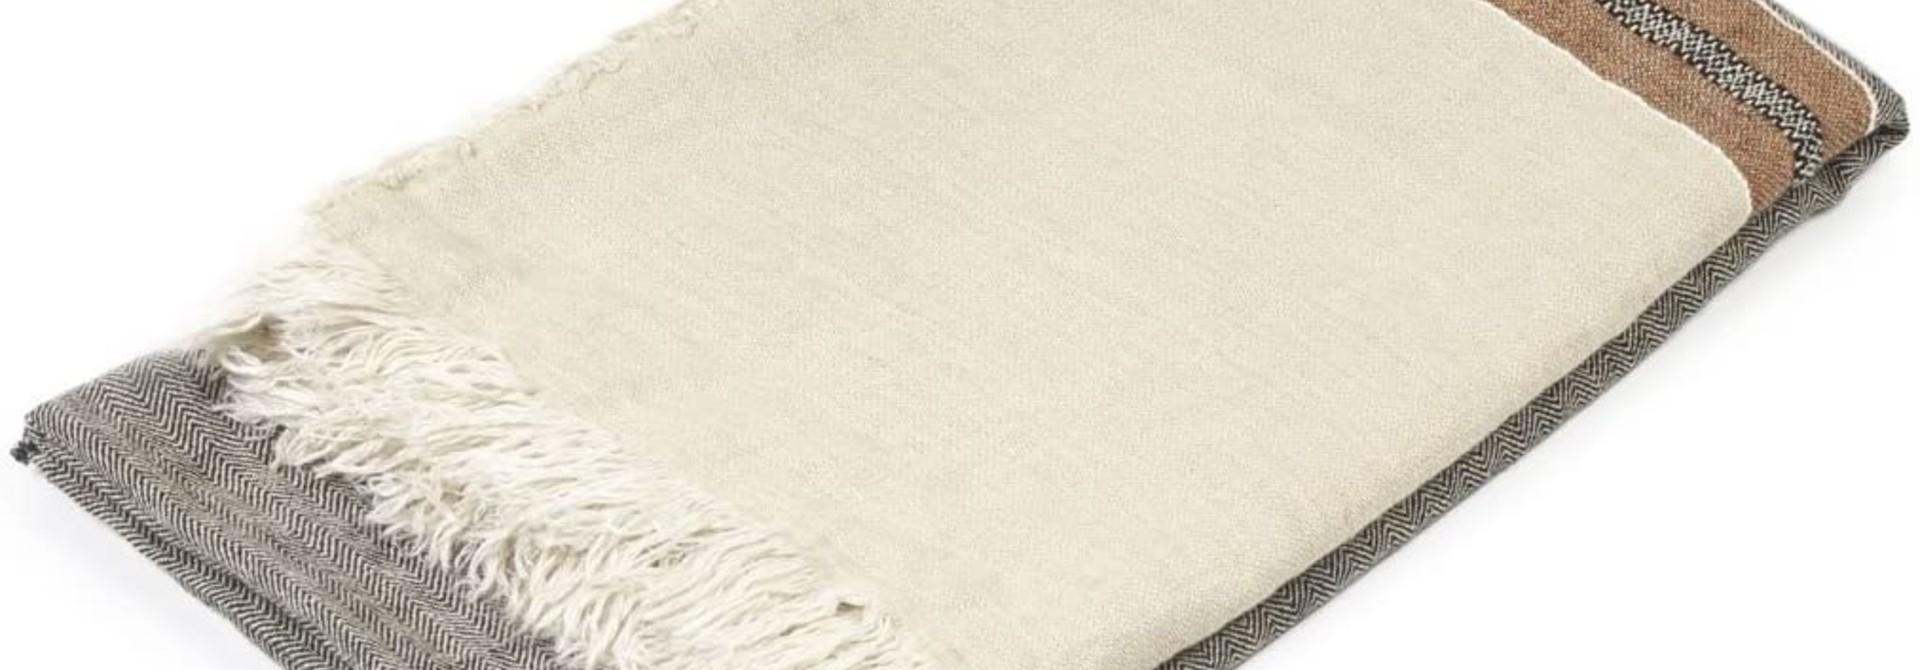 Bath Towel Fouta - Beeswax